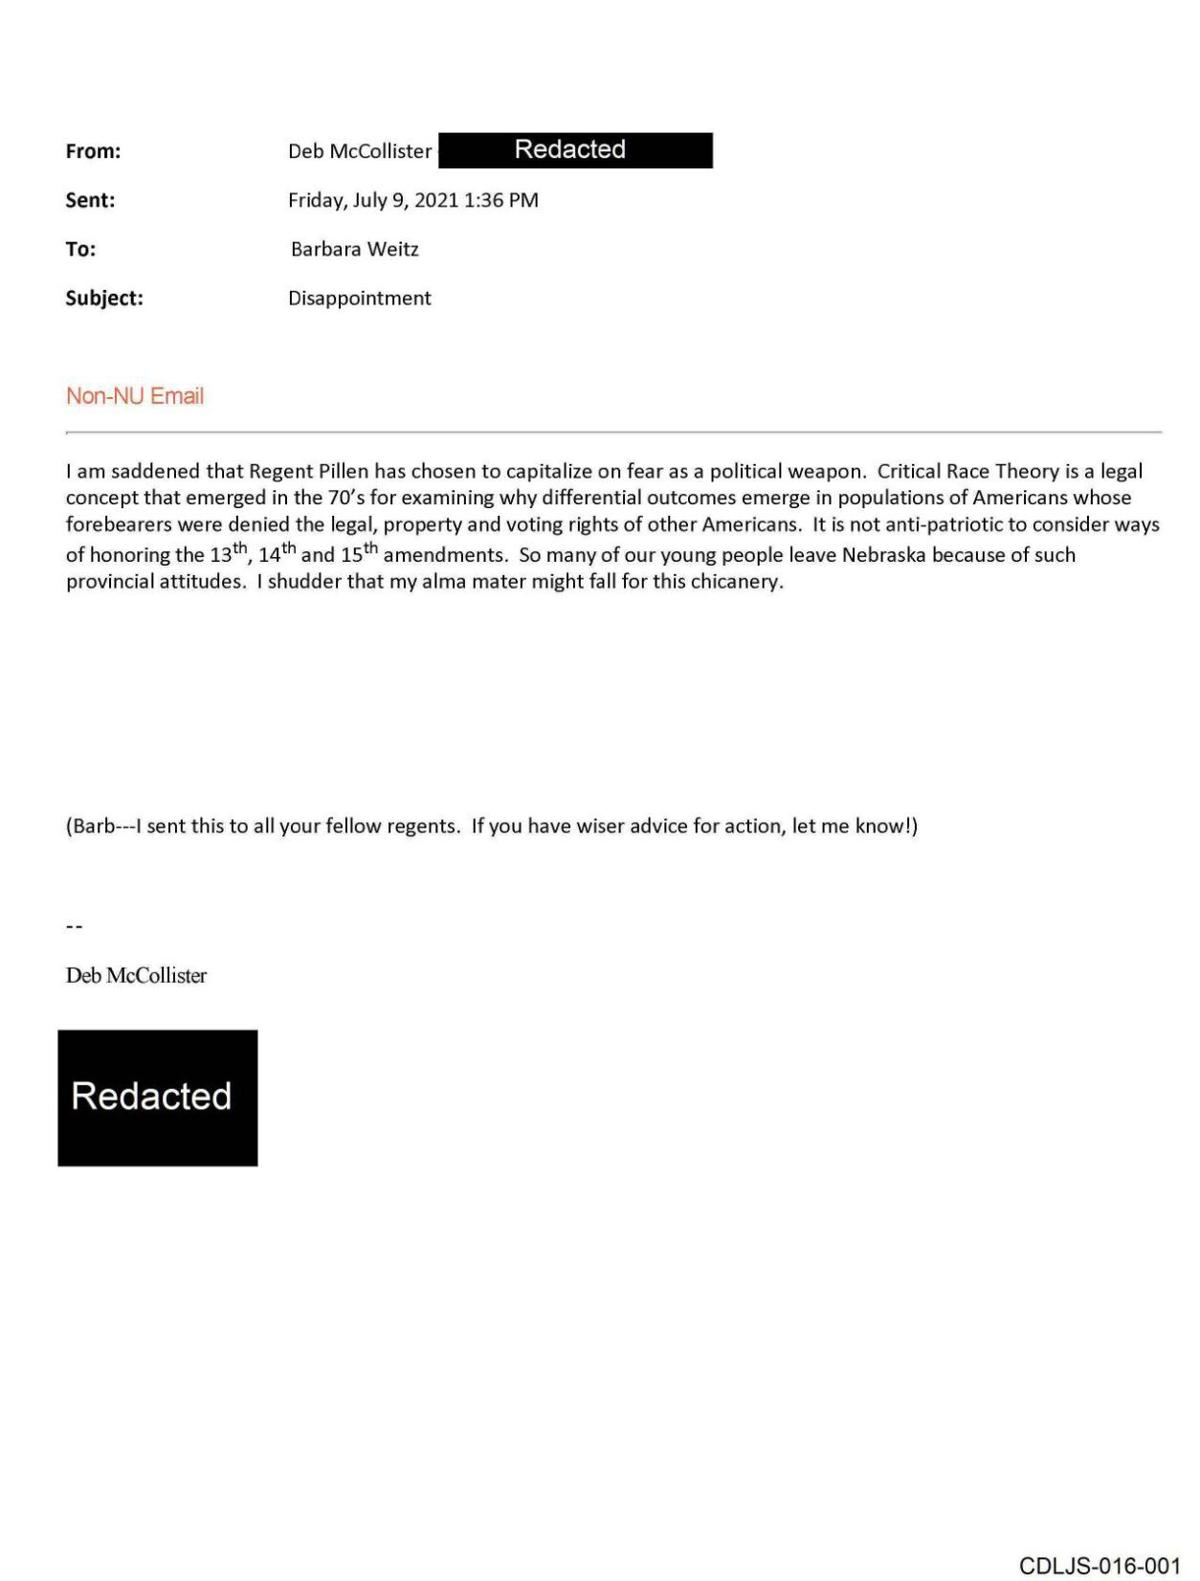 CDLJS-016-001.pdf